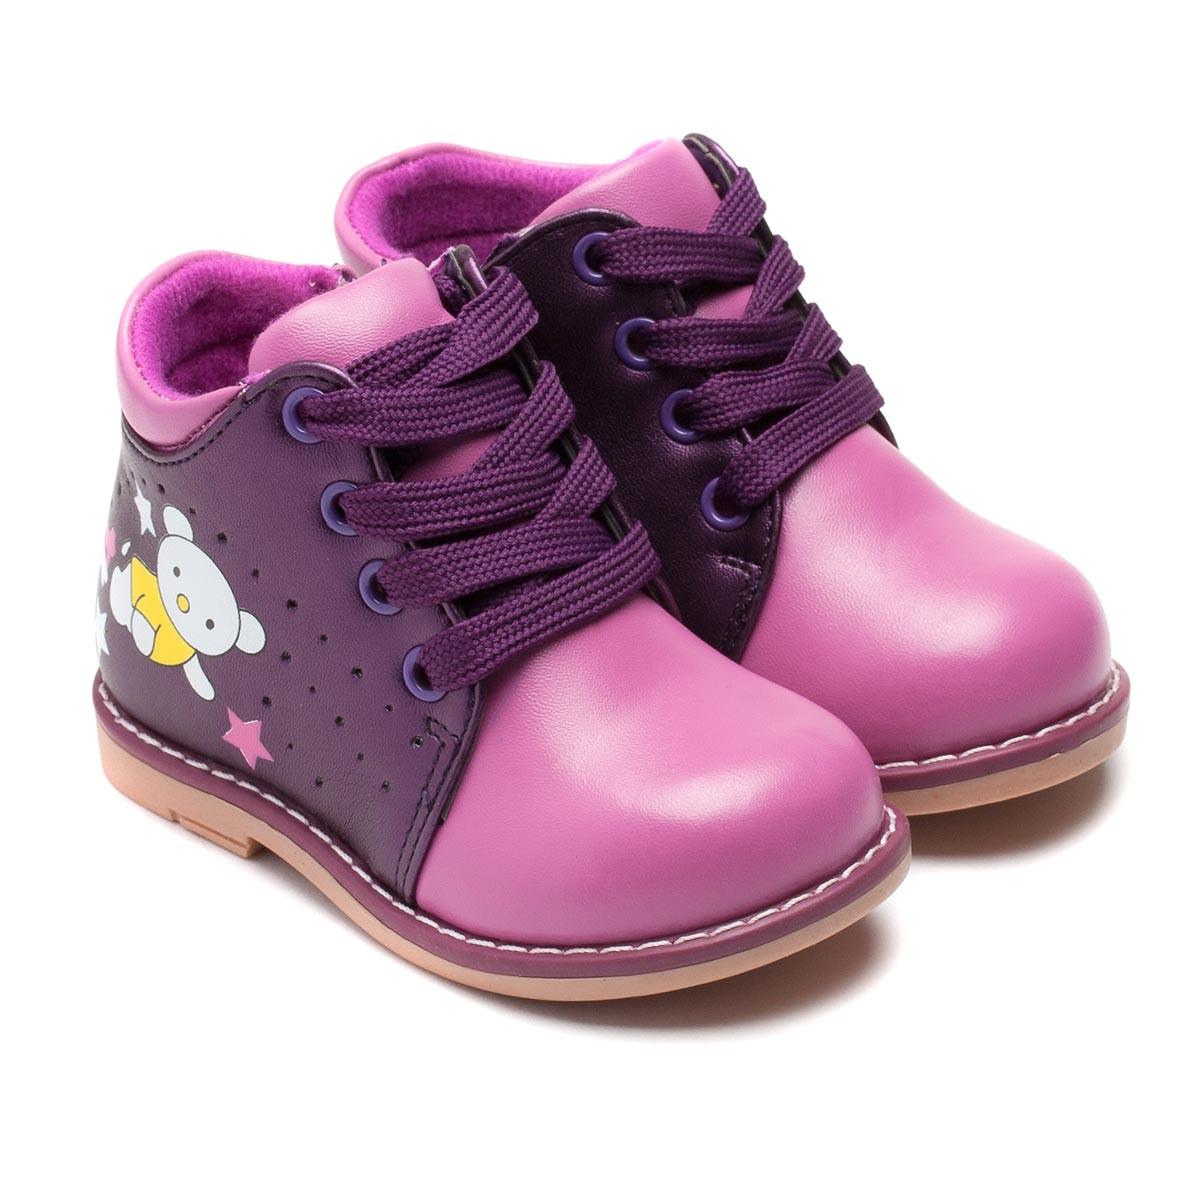 10fe0253b Весенние ботинки Шалунишка - Ортопед для девочки, на шнурочке, размер 20-25  -